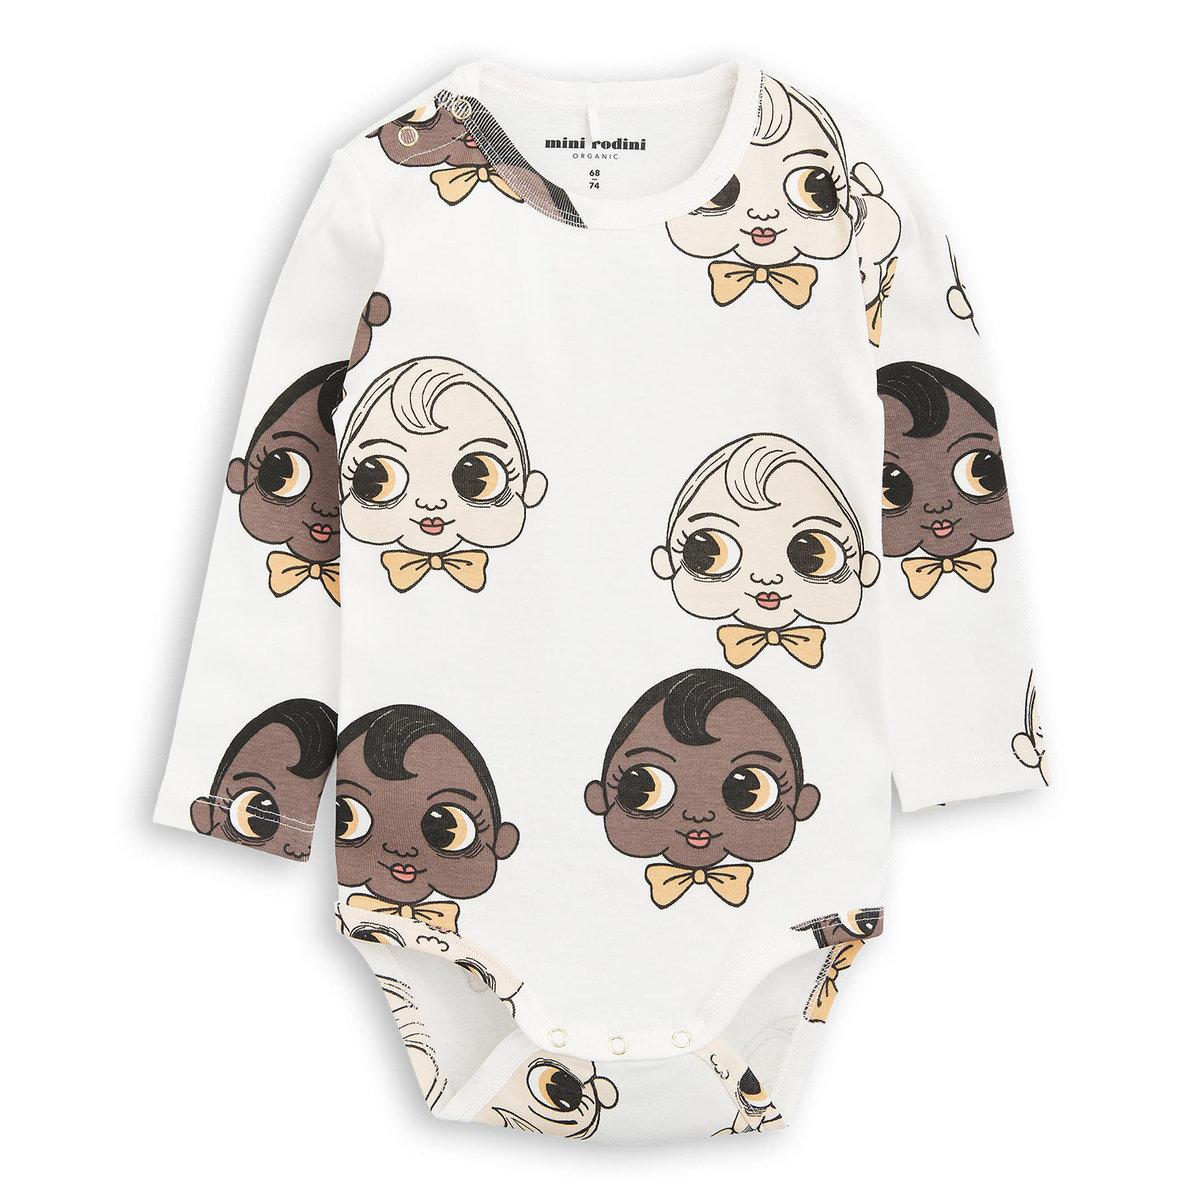 cd8f014081 Home · Mini Rodini  Baby Long Sleeve Bodysuit. Baby Long Sleeve Bodysuit.  Baby Long Sleeve Bodysuit Thumbnail